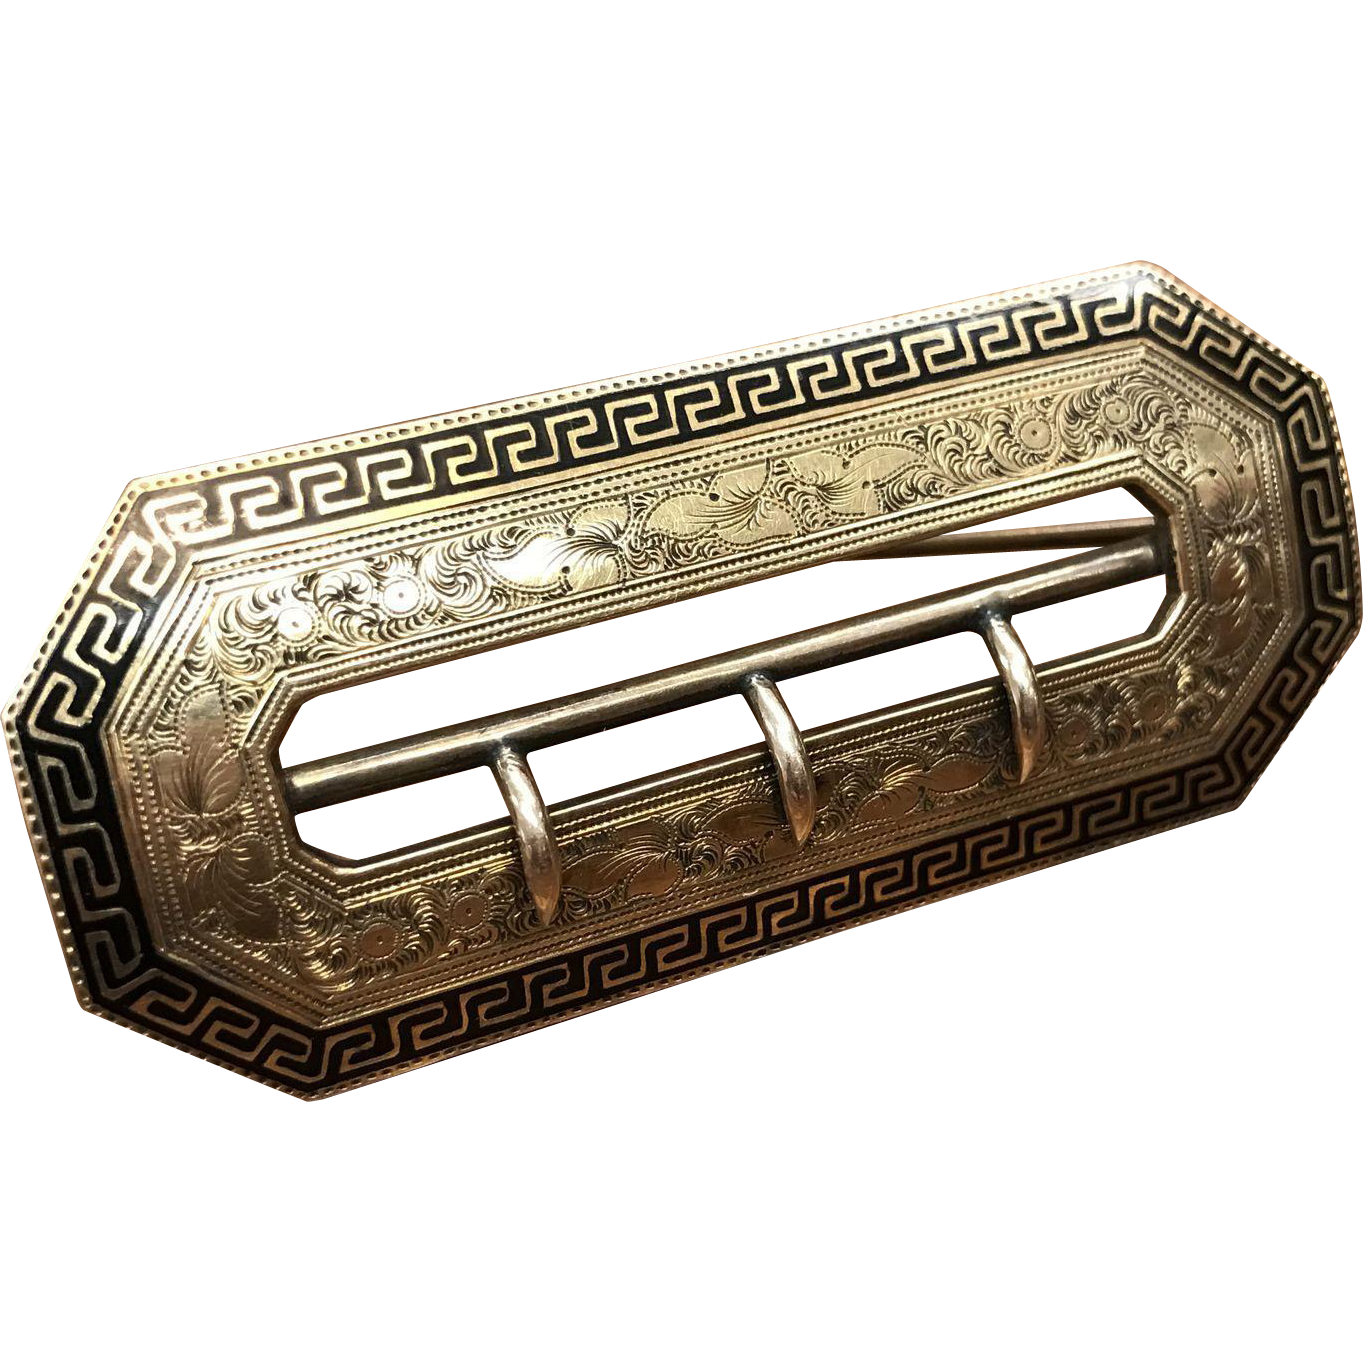 Antique Victorian belt buckle sash brooch with black enamel and engraving